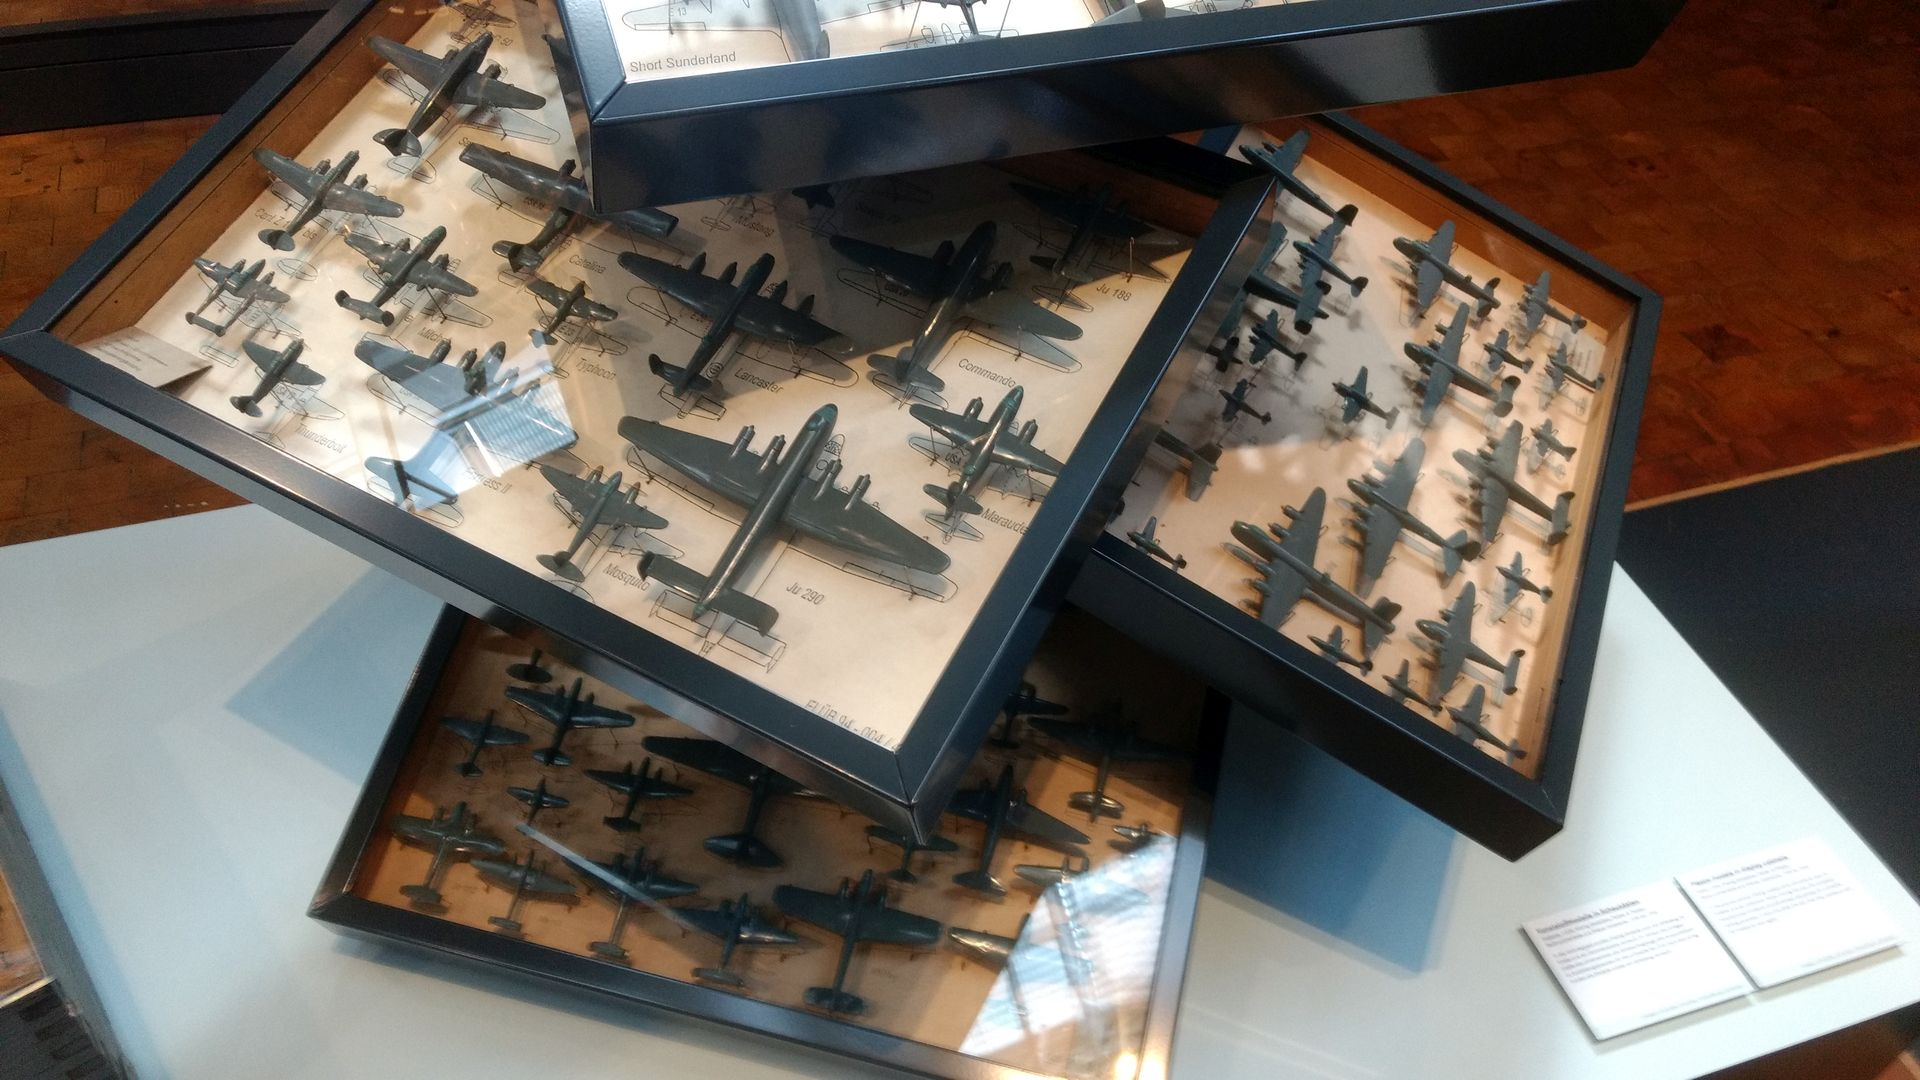 Deutsches Technikmuseum Berlin 41818175870_6ae168898f_o